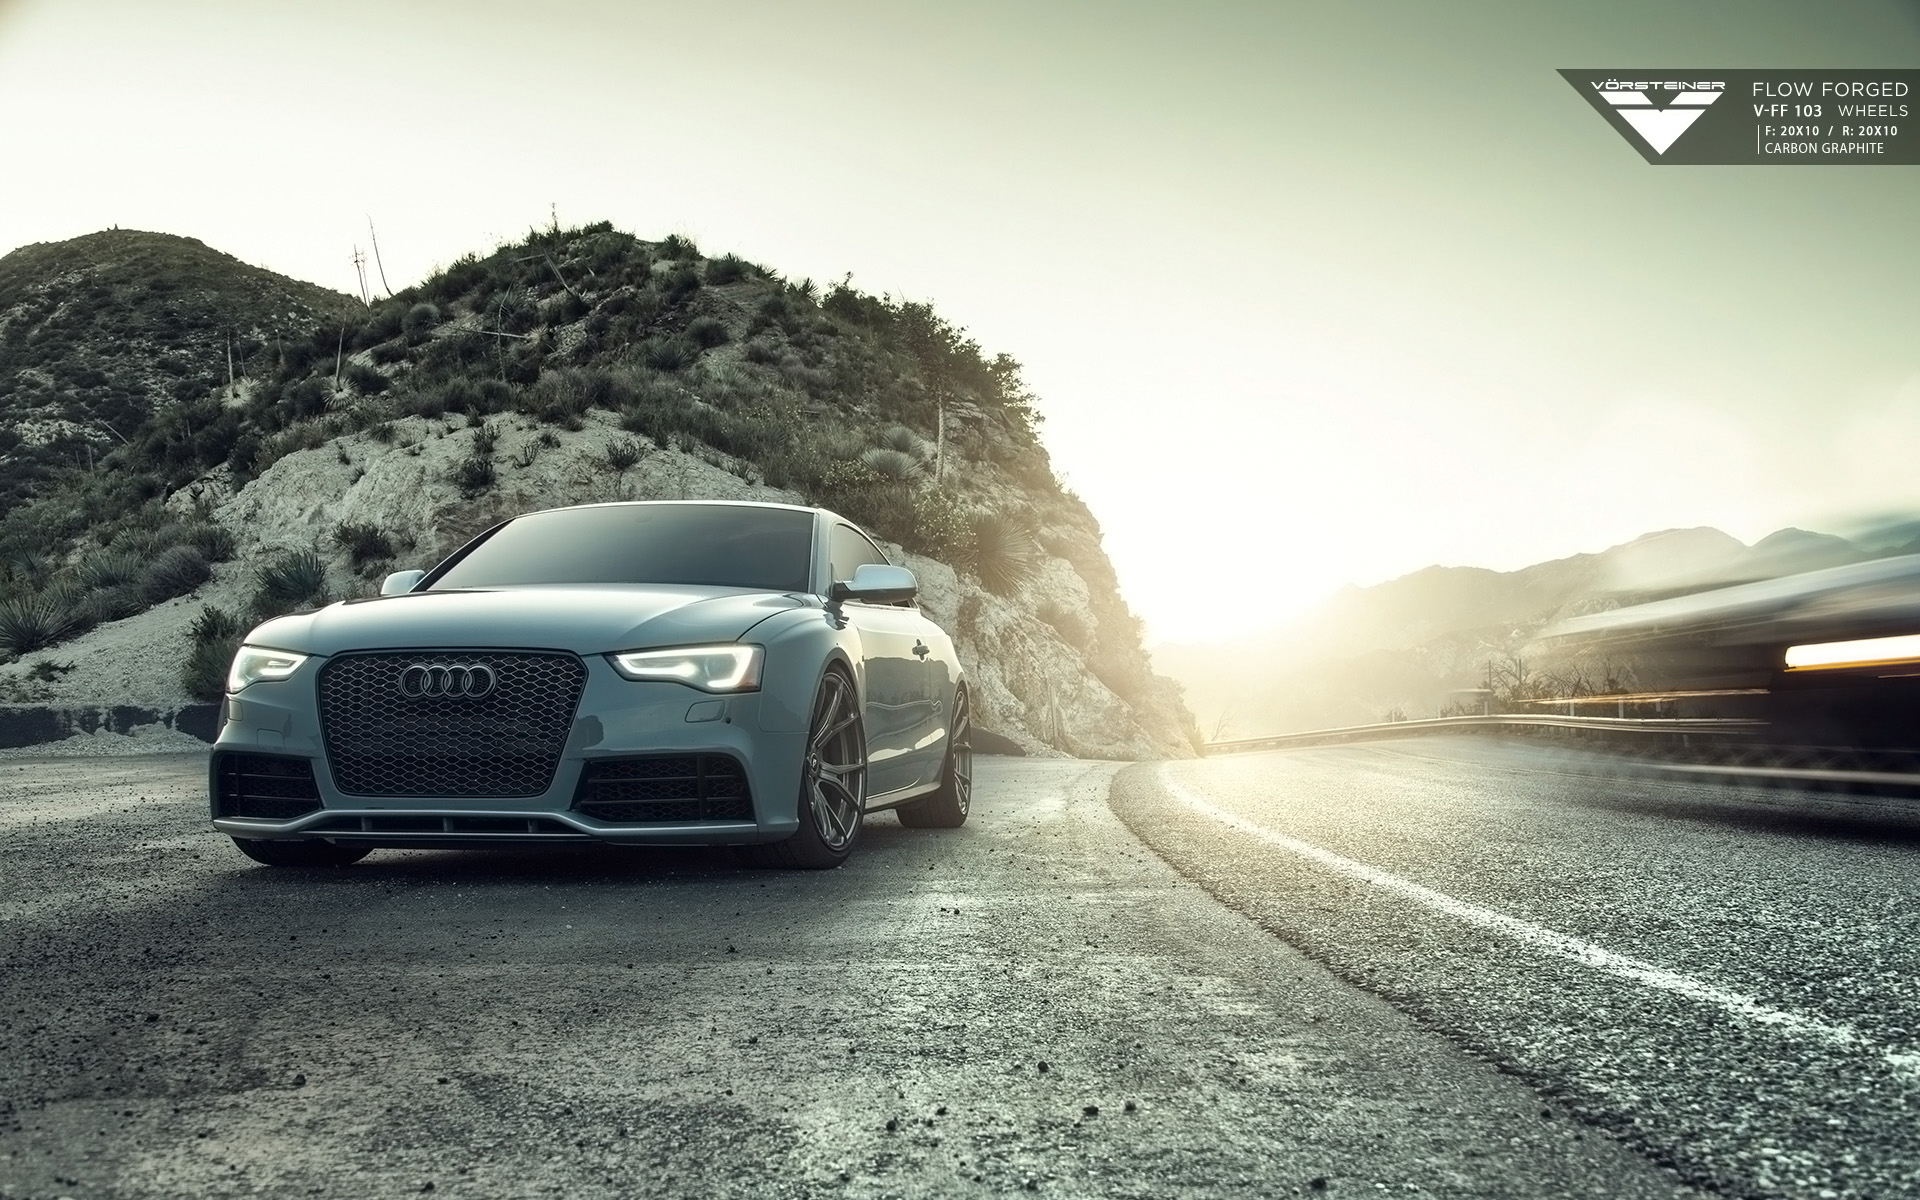 Audi R8 Iphone Wallpaper Hd 2015 Vorsteiner Audi Rs5 V Ff 103 Wallpaper Hd Car